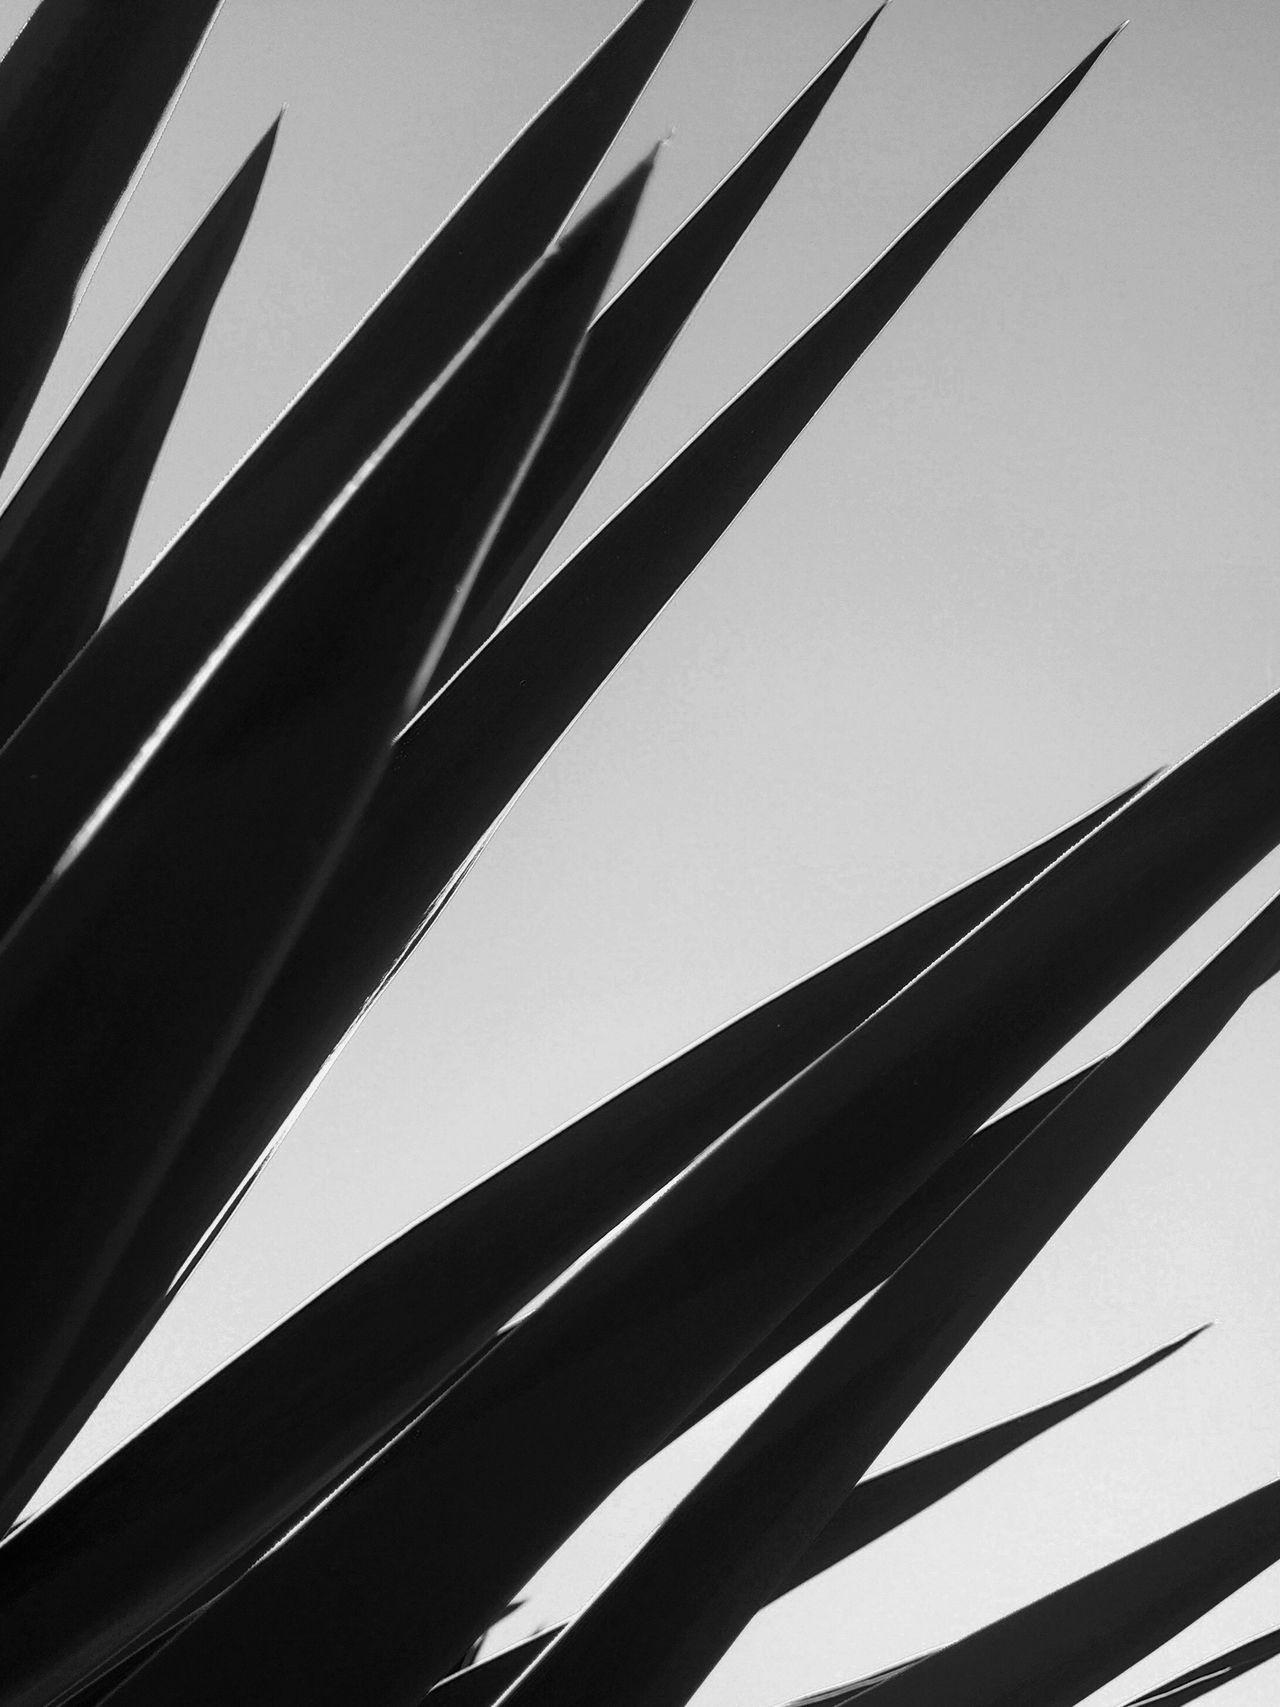 Monochrome Photography Sharp Pattern